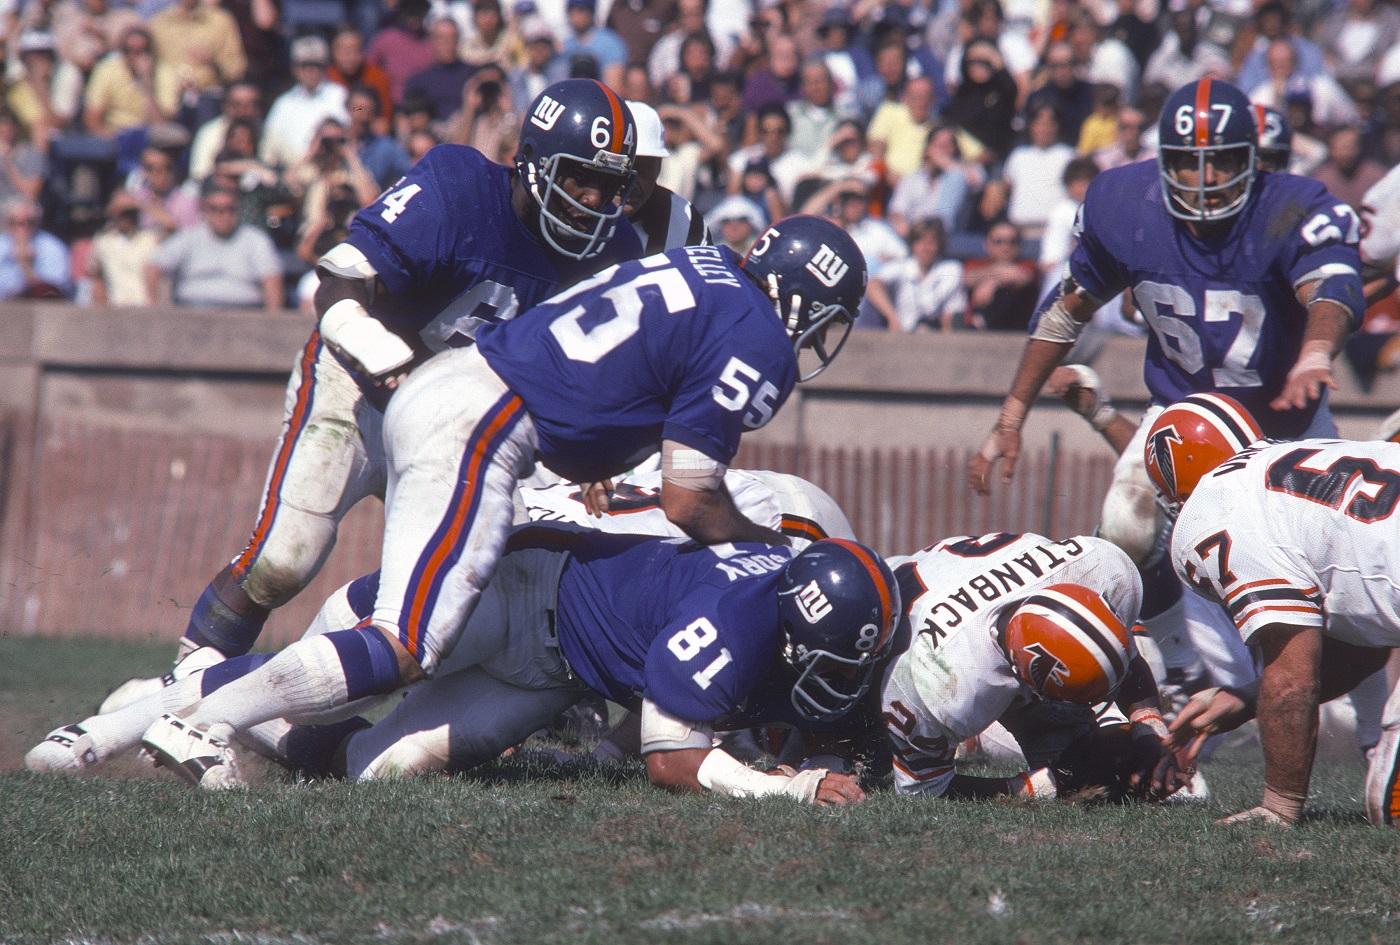 Giants vs. Falcons at Yale Bowl